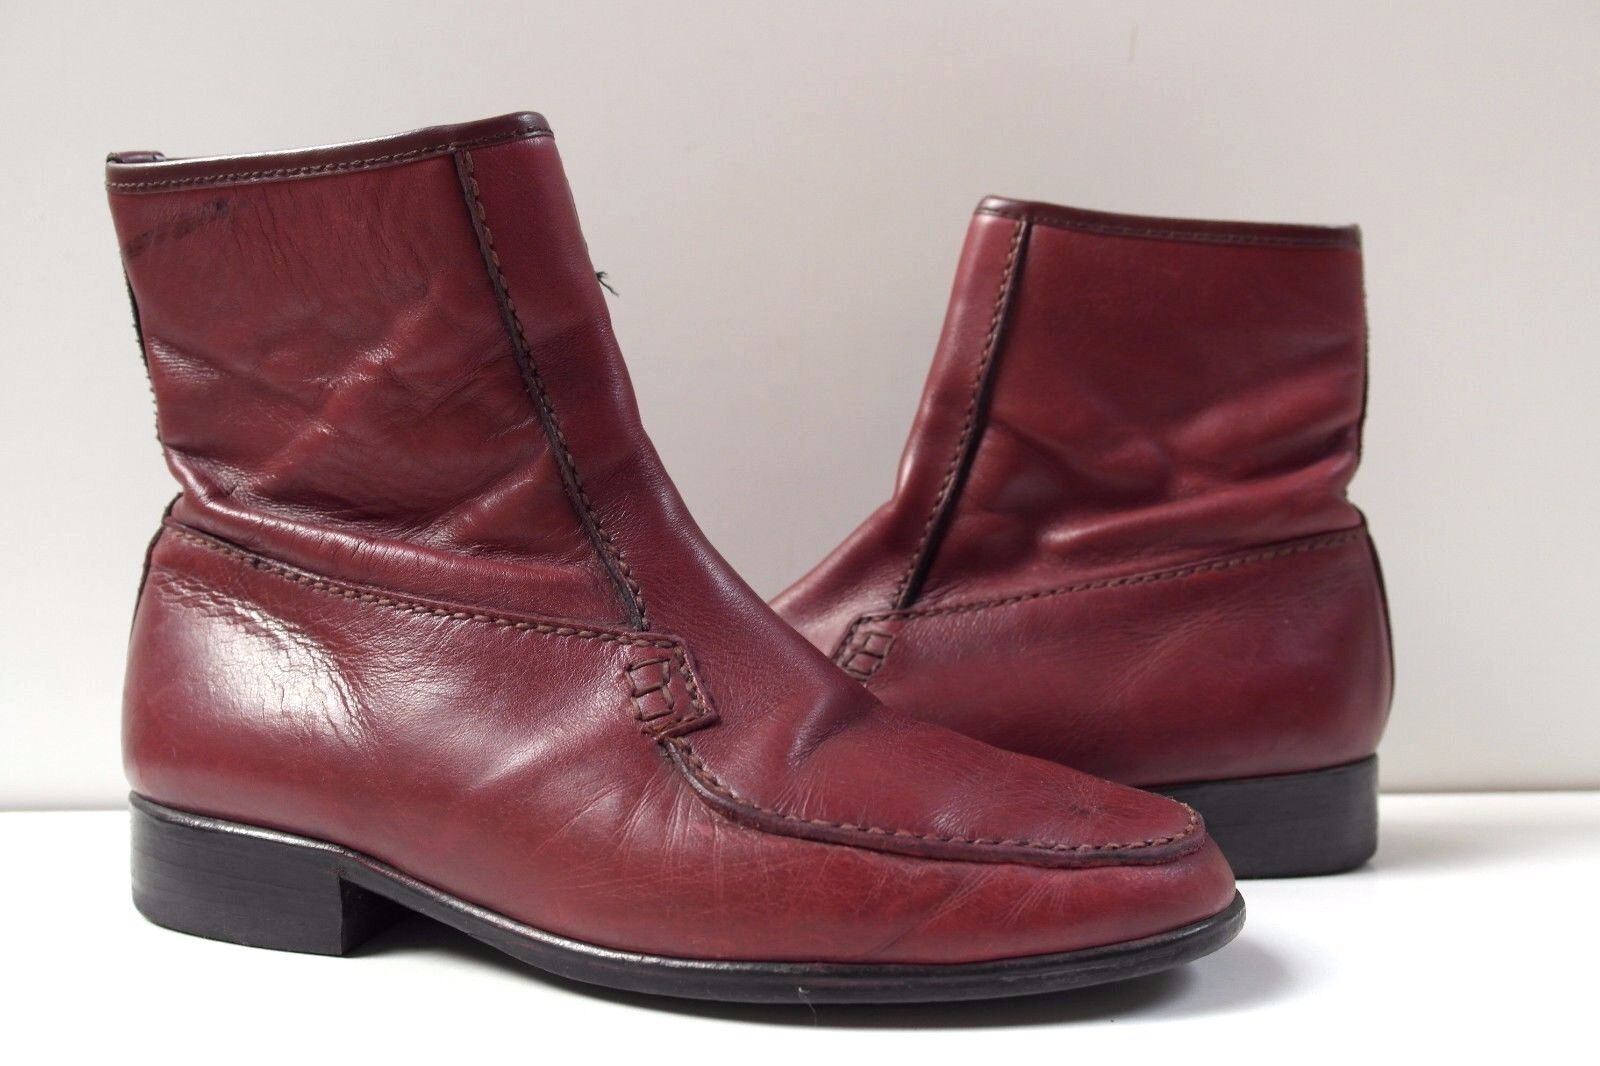 True Vintage Stivaletti Scarpe Donna Stivali Ankle Boots BORDEAUX BOOTIES